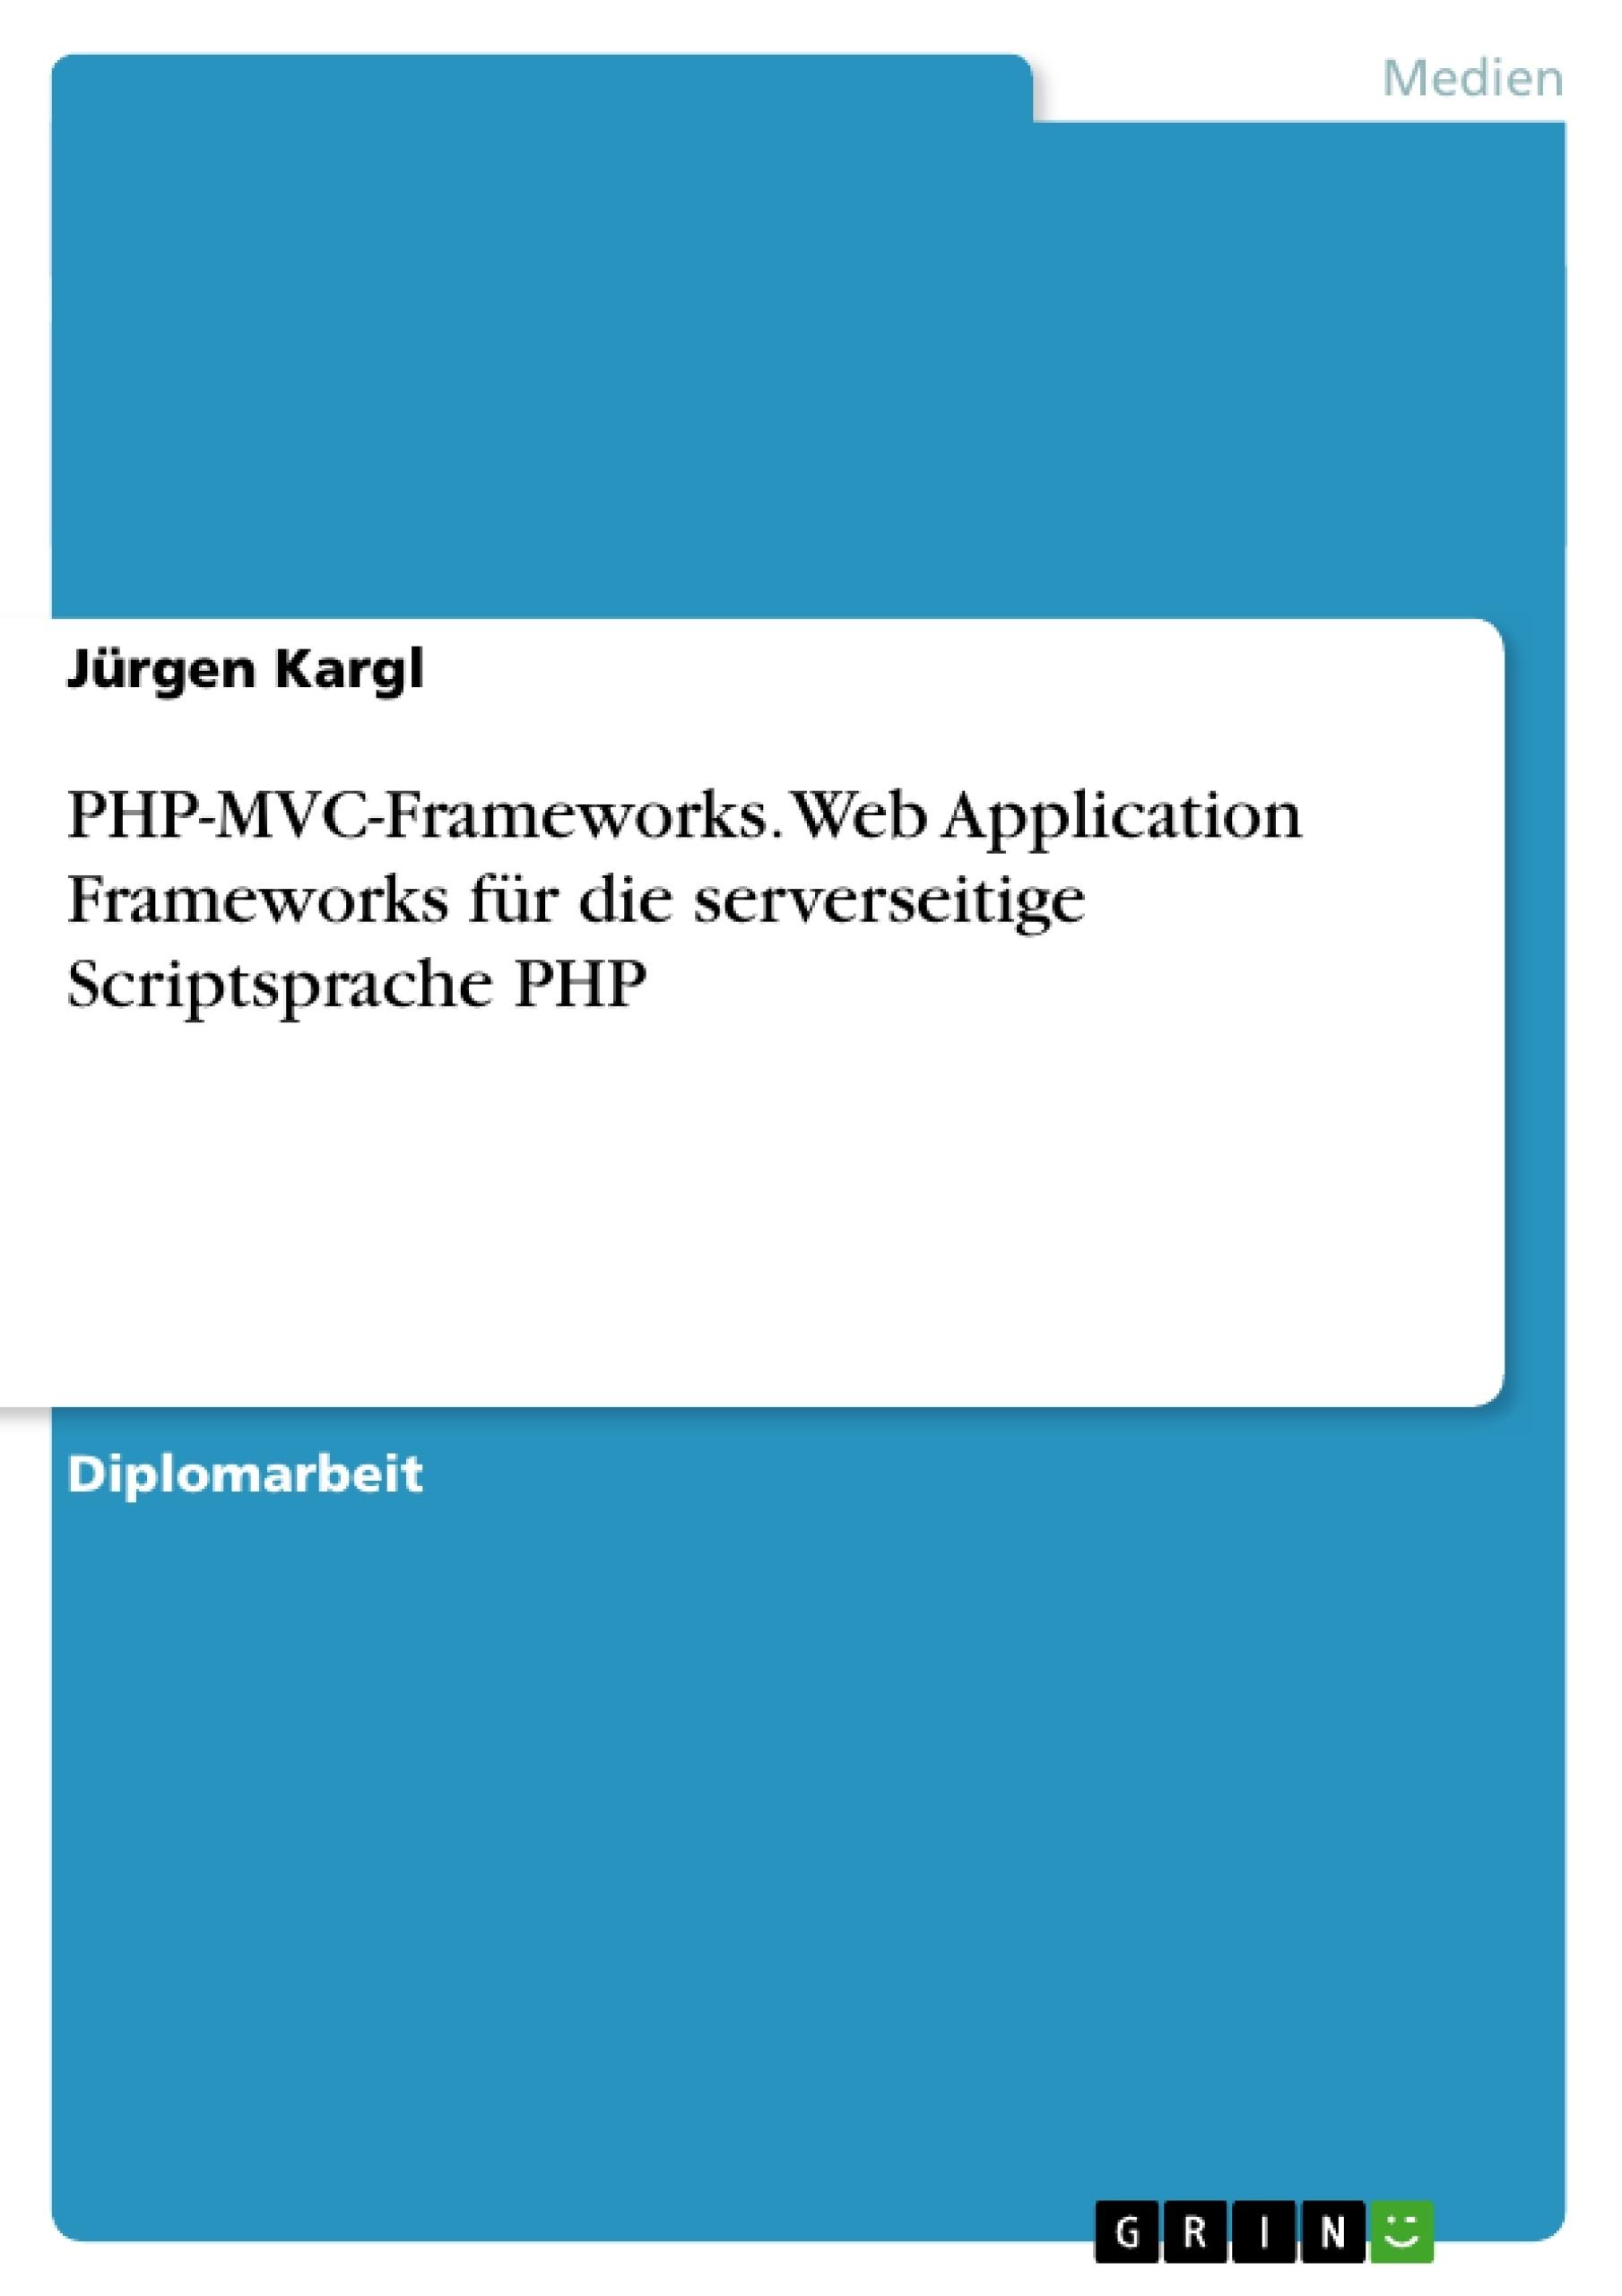 Titel: PHP-MVC-Frameworks. Web Application Frameworks für die serverseitige Scriptsprache PHP